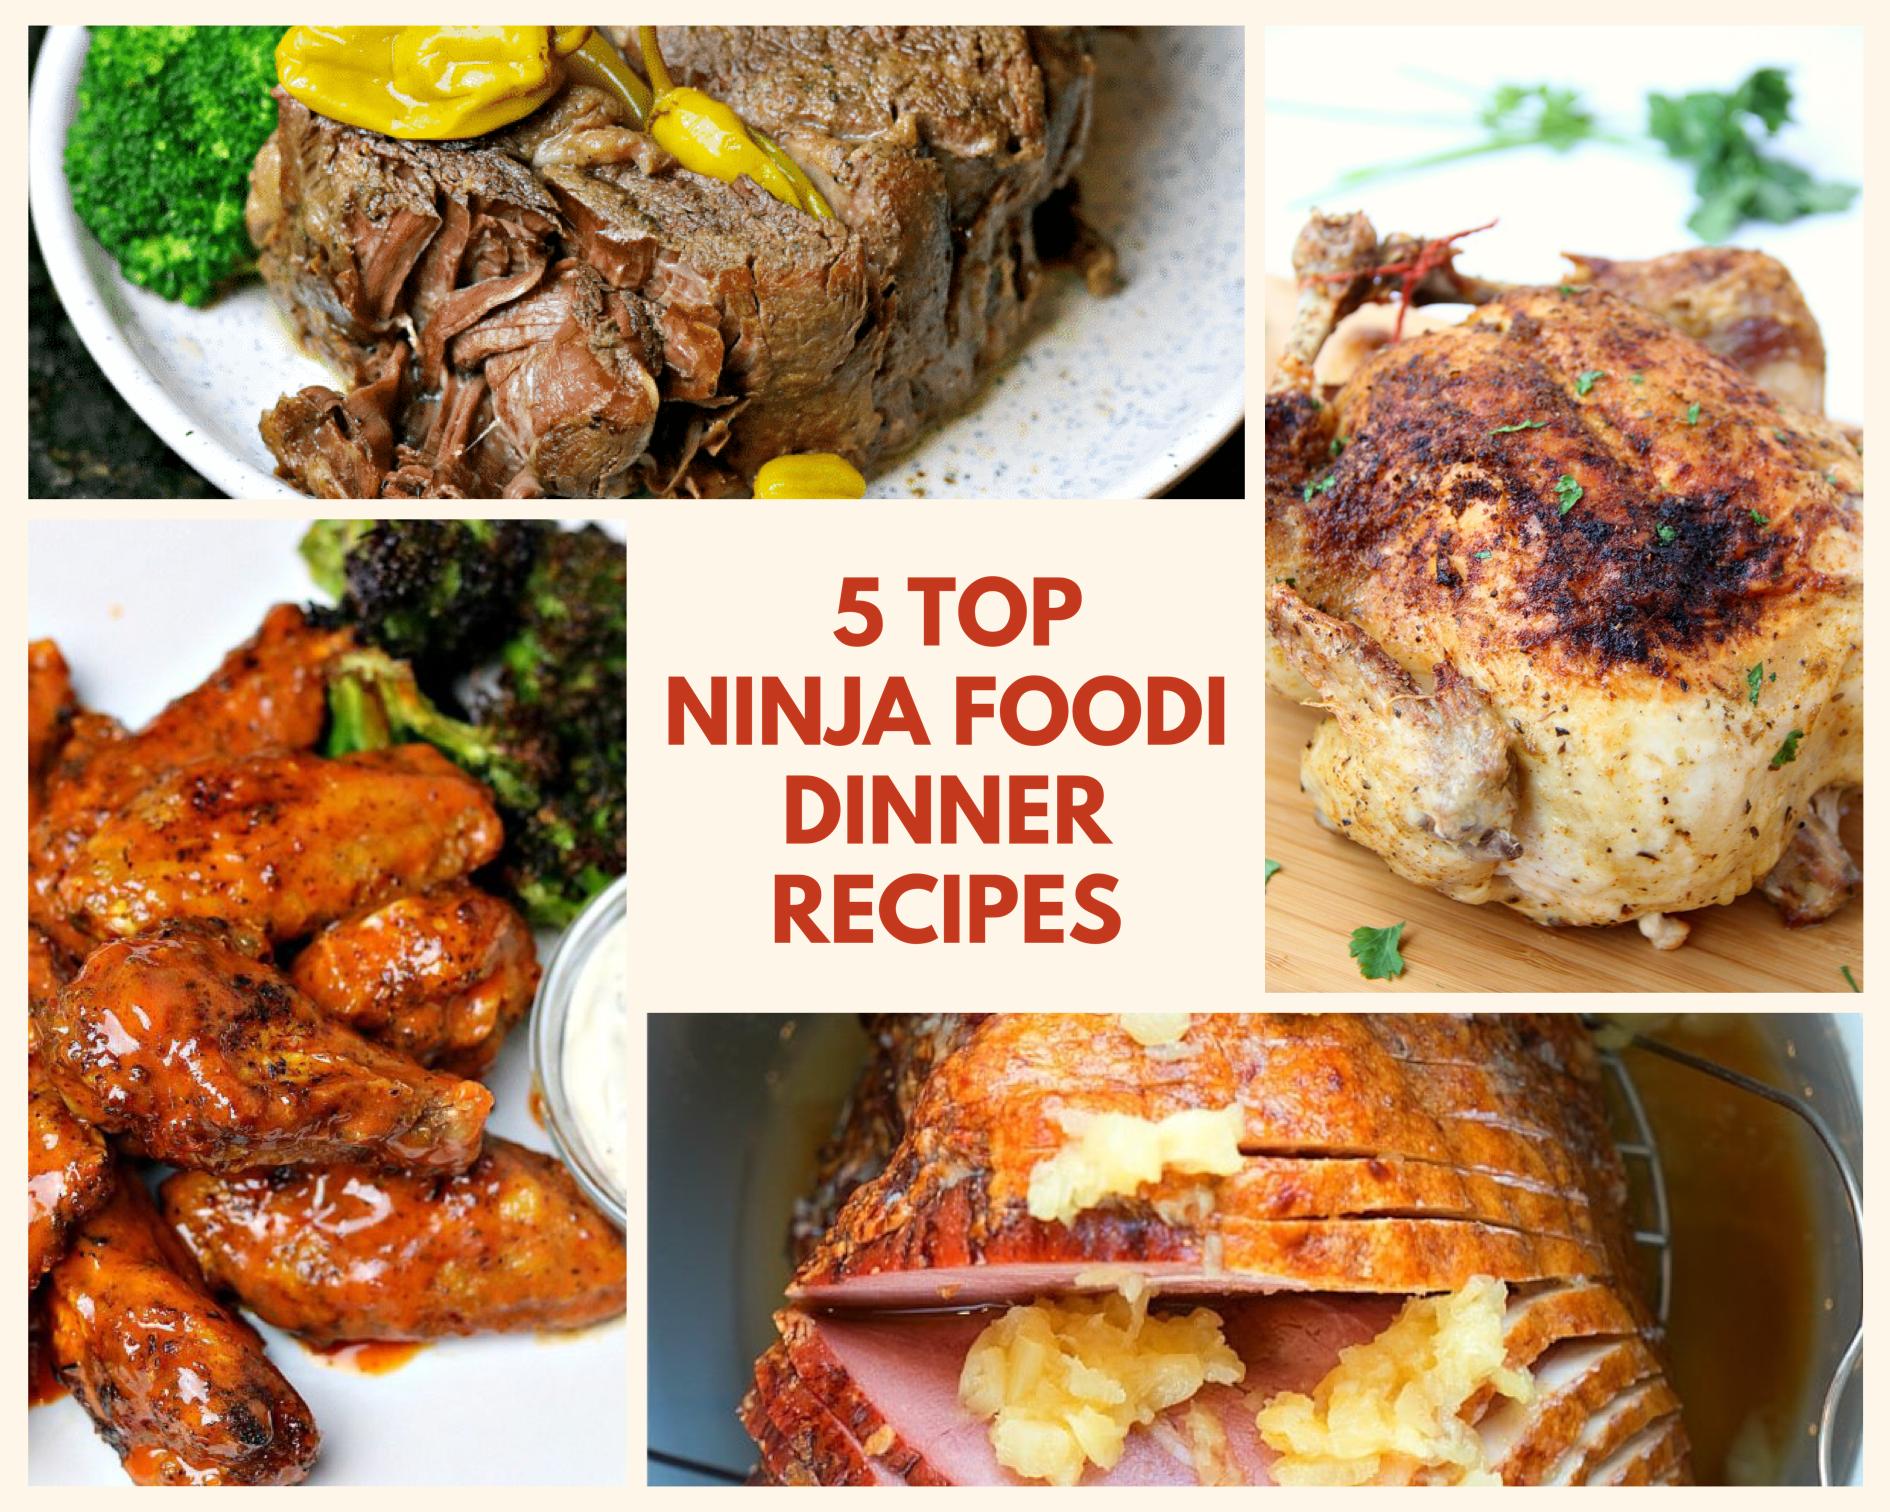 5 Top Ninja Foodi Dinner Recipes